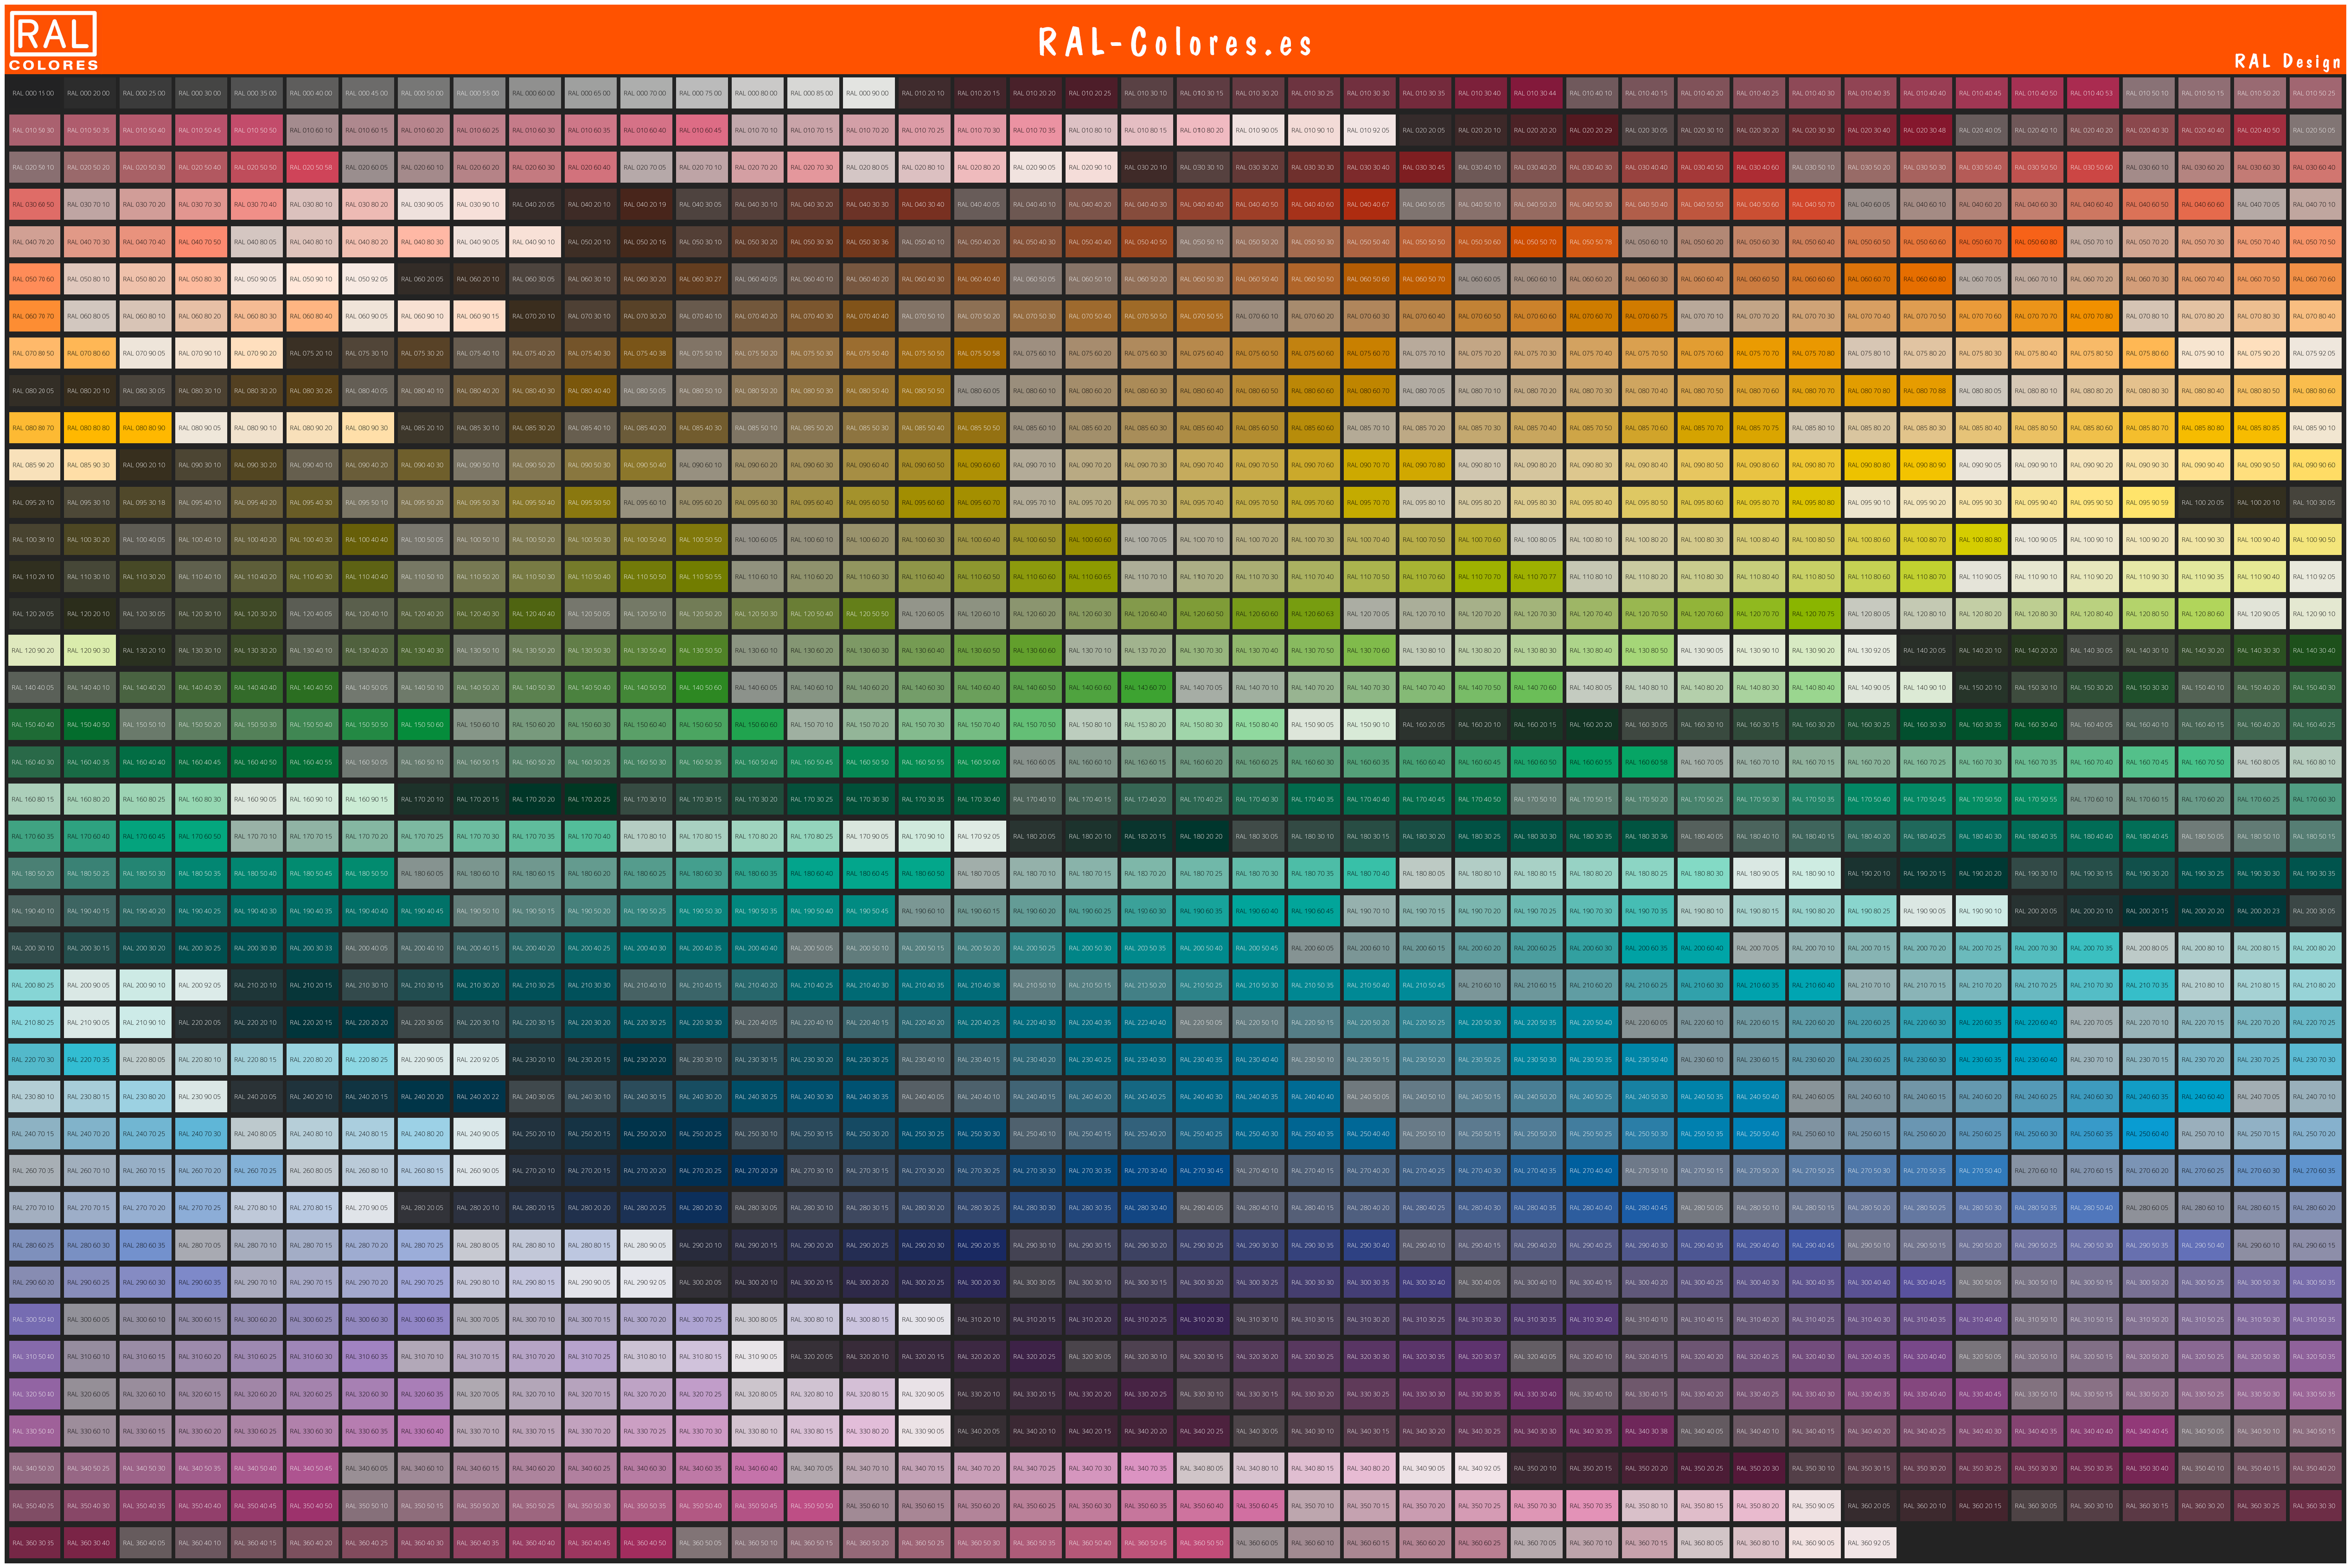 Carta de colores RAL Design